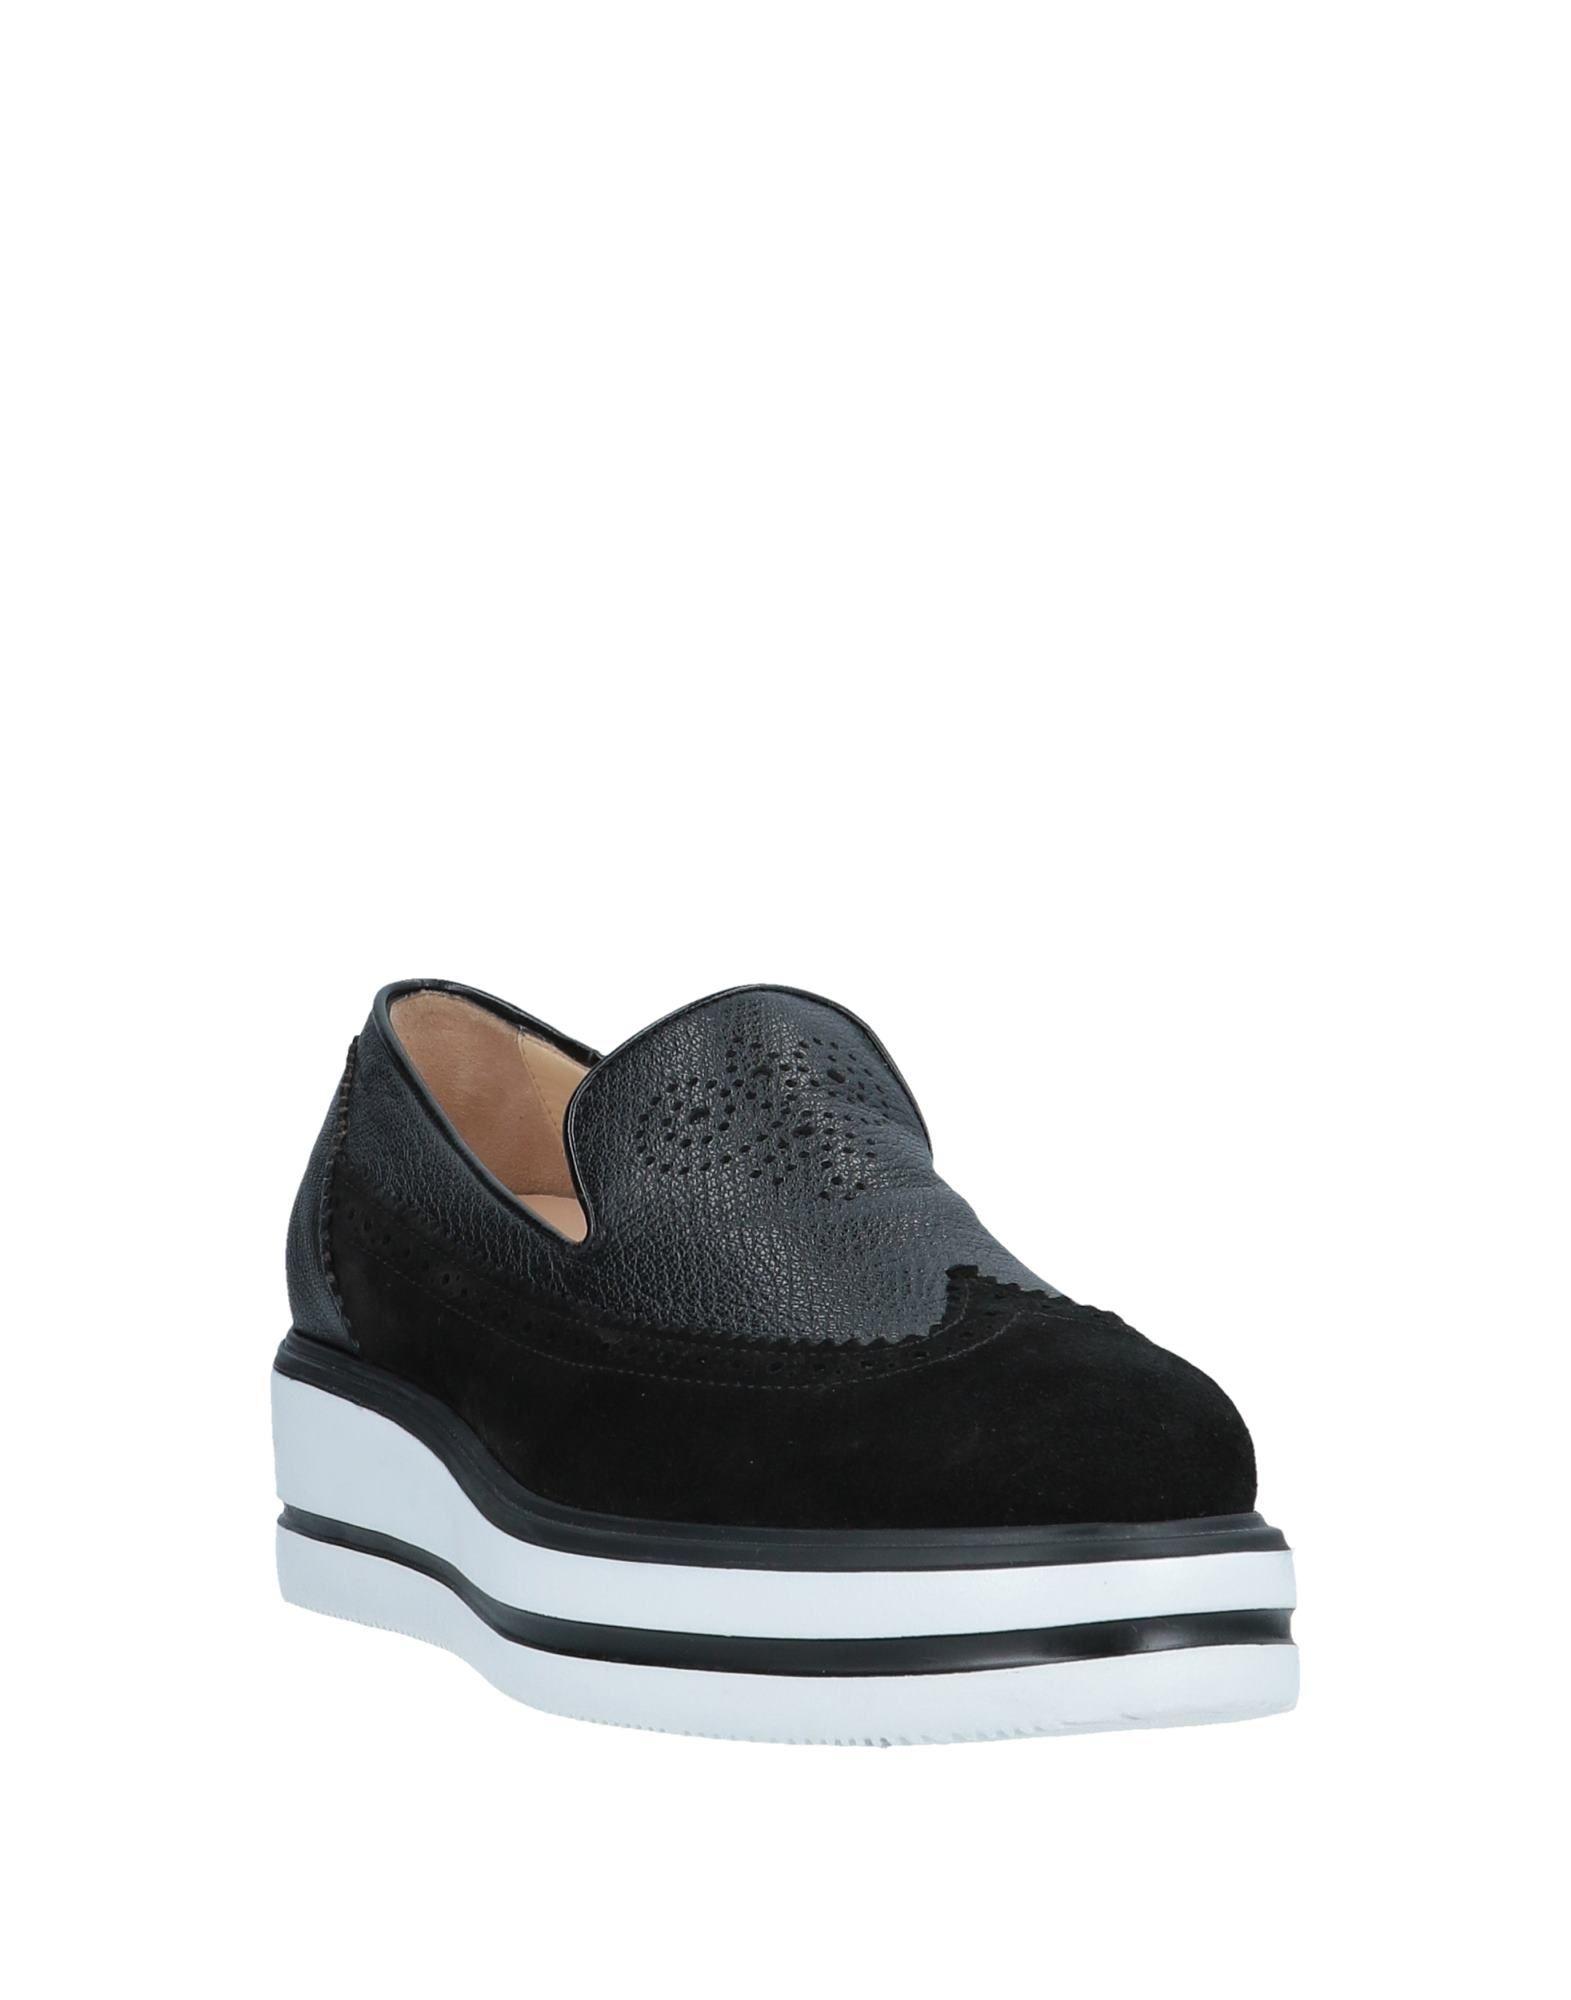 Hogan aussehende Mokassins Damen  11557612NHGut aussehende Hogan strapazierfähige Schuhe 4e2865